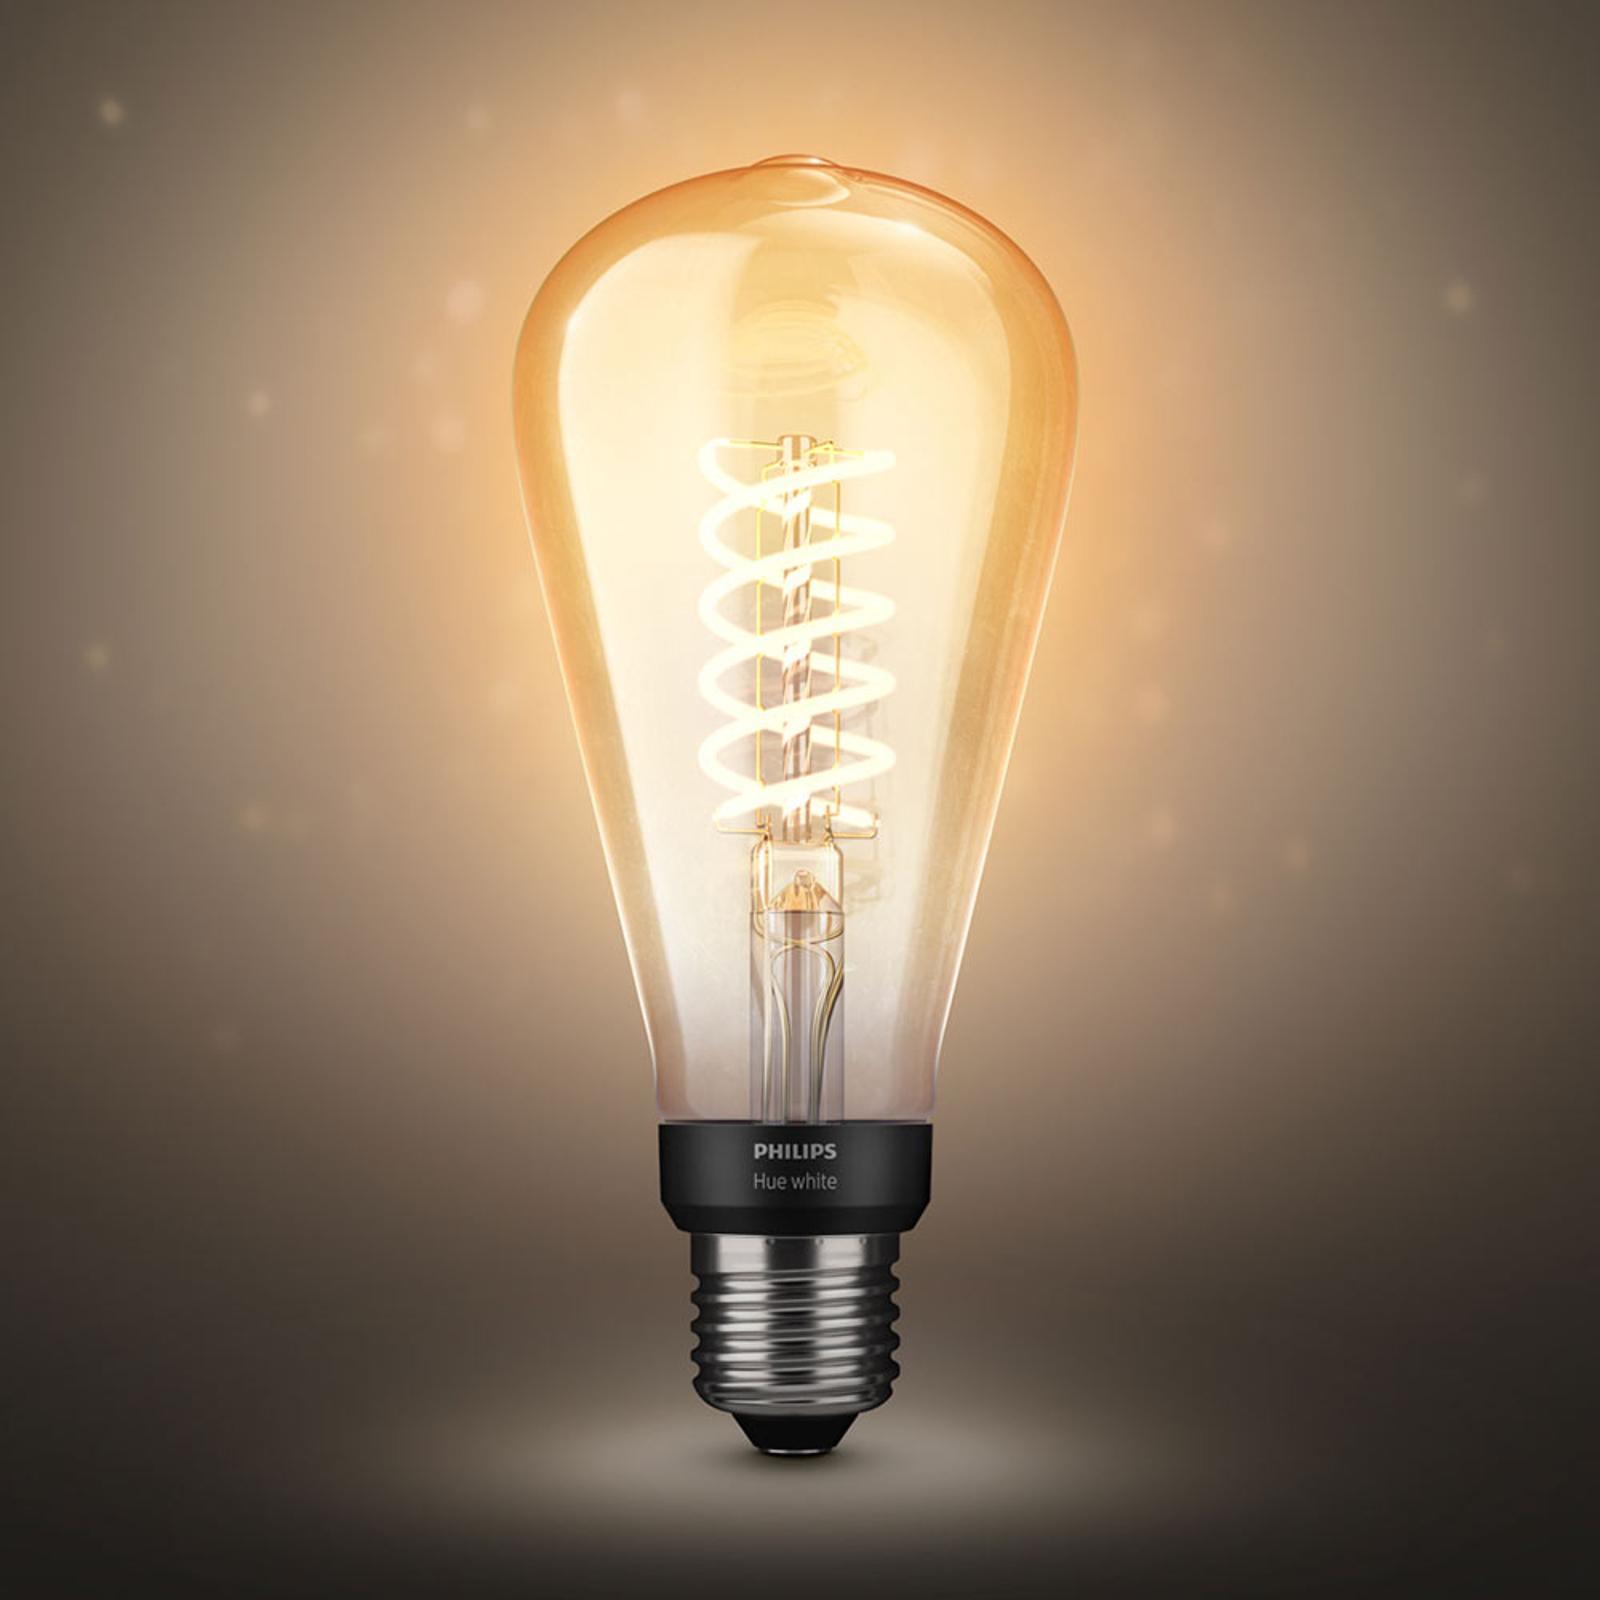 Philips Hue White Giant Filament-Lampe E27 7W